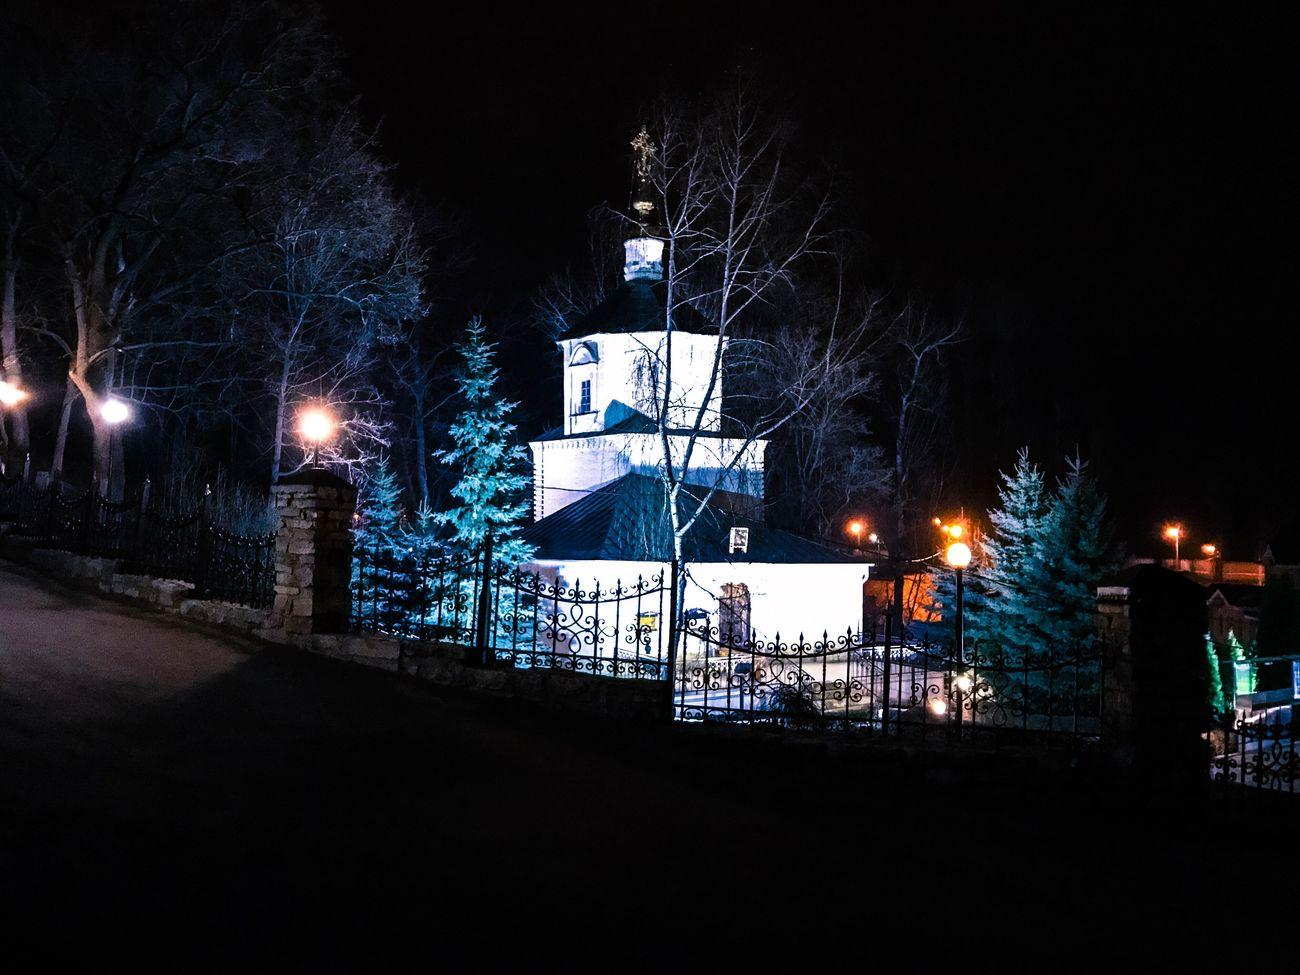 Night Illuminated Street Light Building Exterior Outdoors Bare Tree Tree Sky Architecture No People Lipetsk липецк